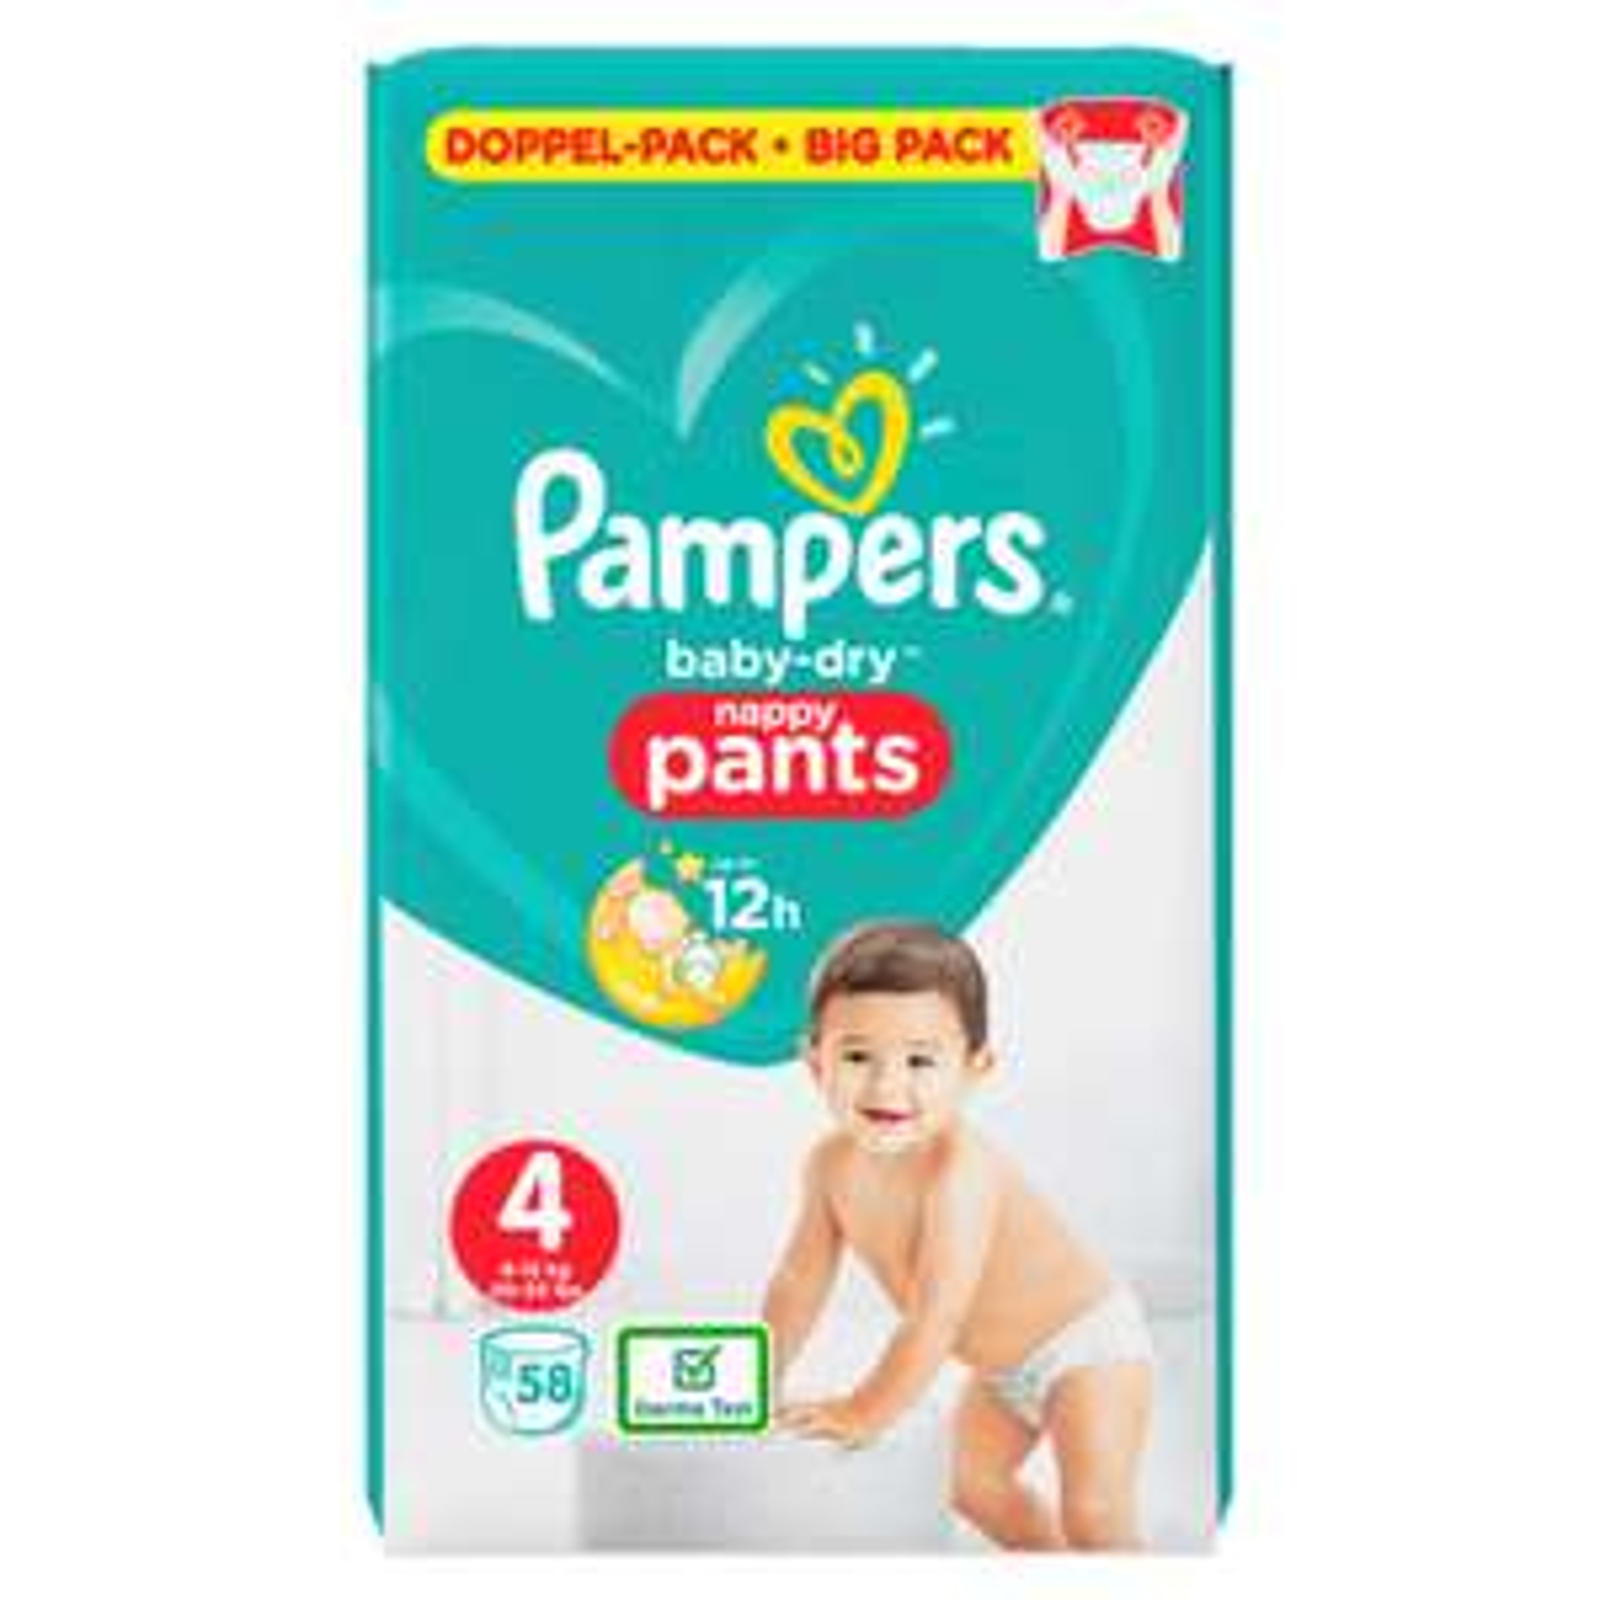 Pampers Baby-Dry Pants - Windeln im Doppelpack - Größe 4 / 5 / 6 - bei [Aldi Nord] ab 04.10.